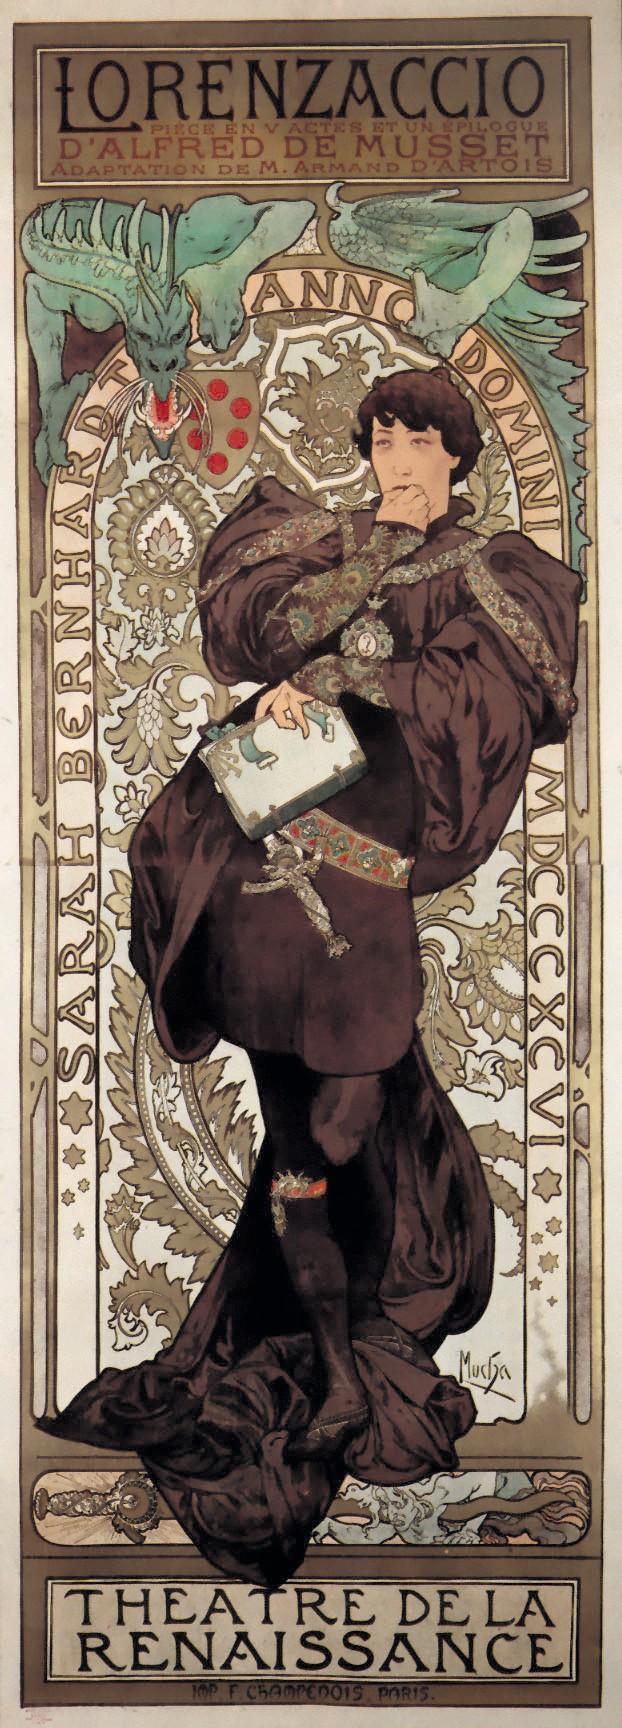 Alfons Mucha, affiche de la pièce Lorenzaccio, 1896